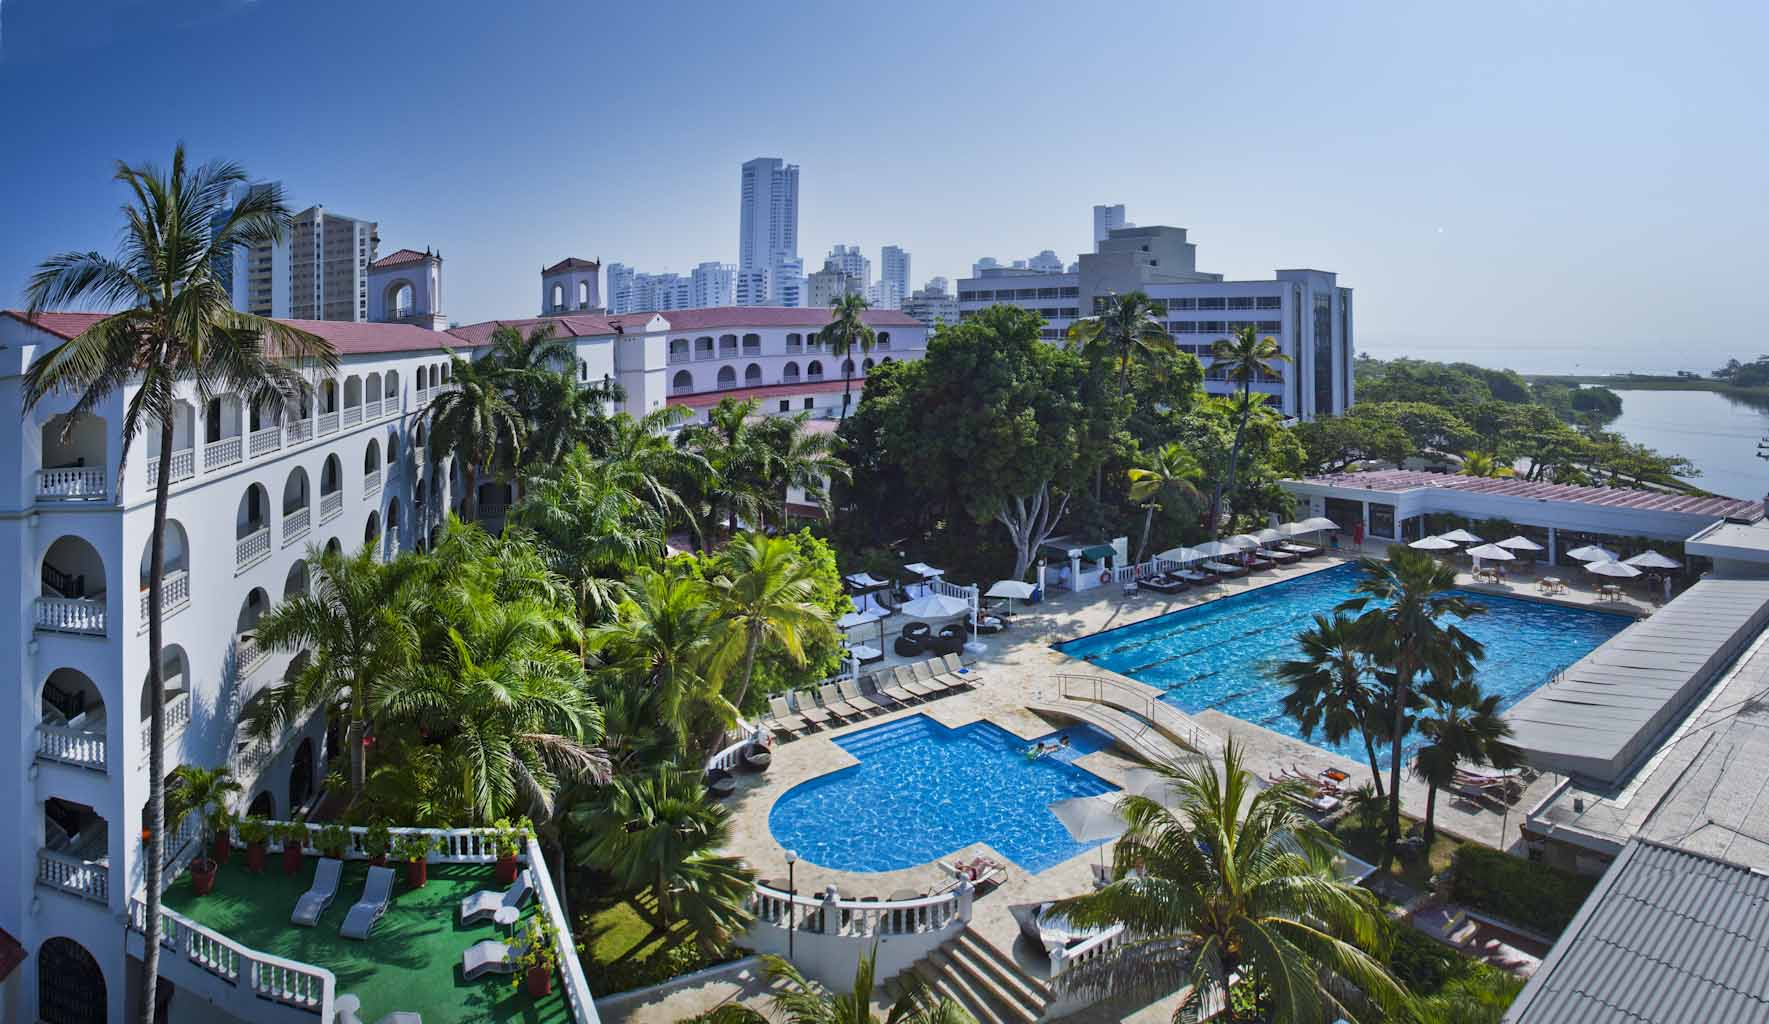 Best List of Luxury Hotels in Cartagena, Colombia - Hotel Caribe Cartagena